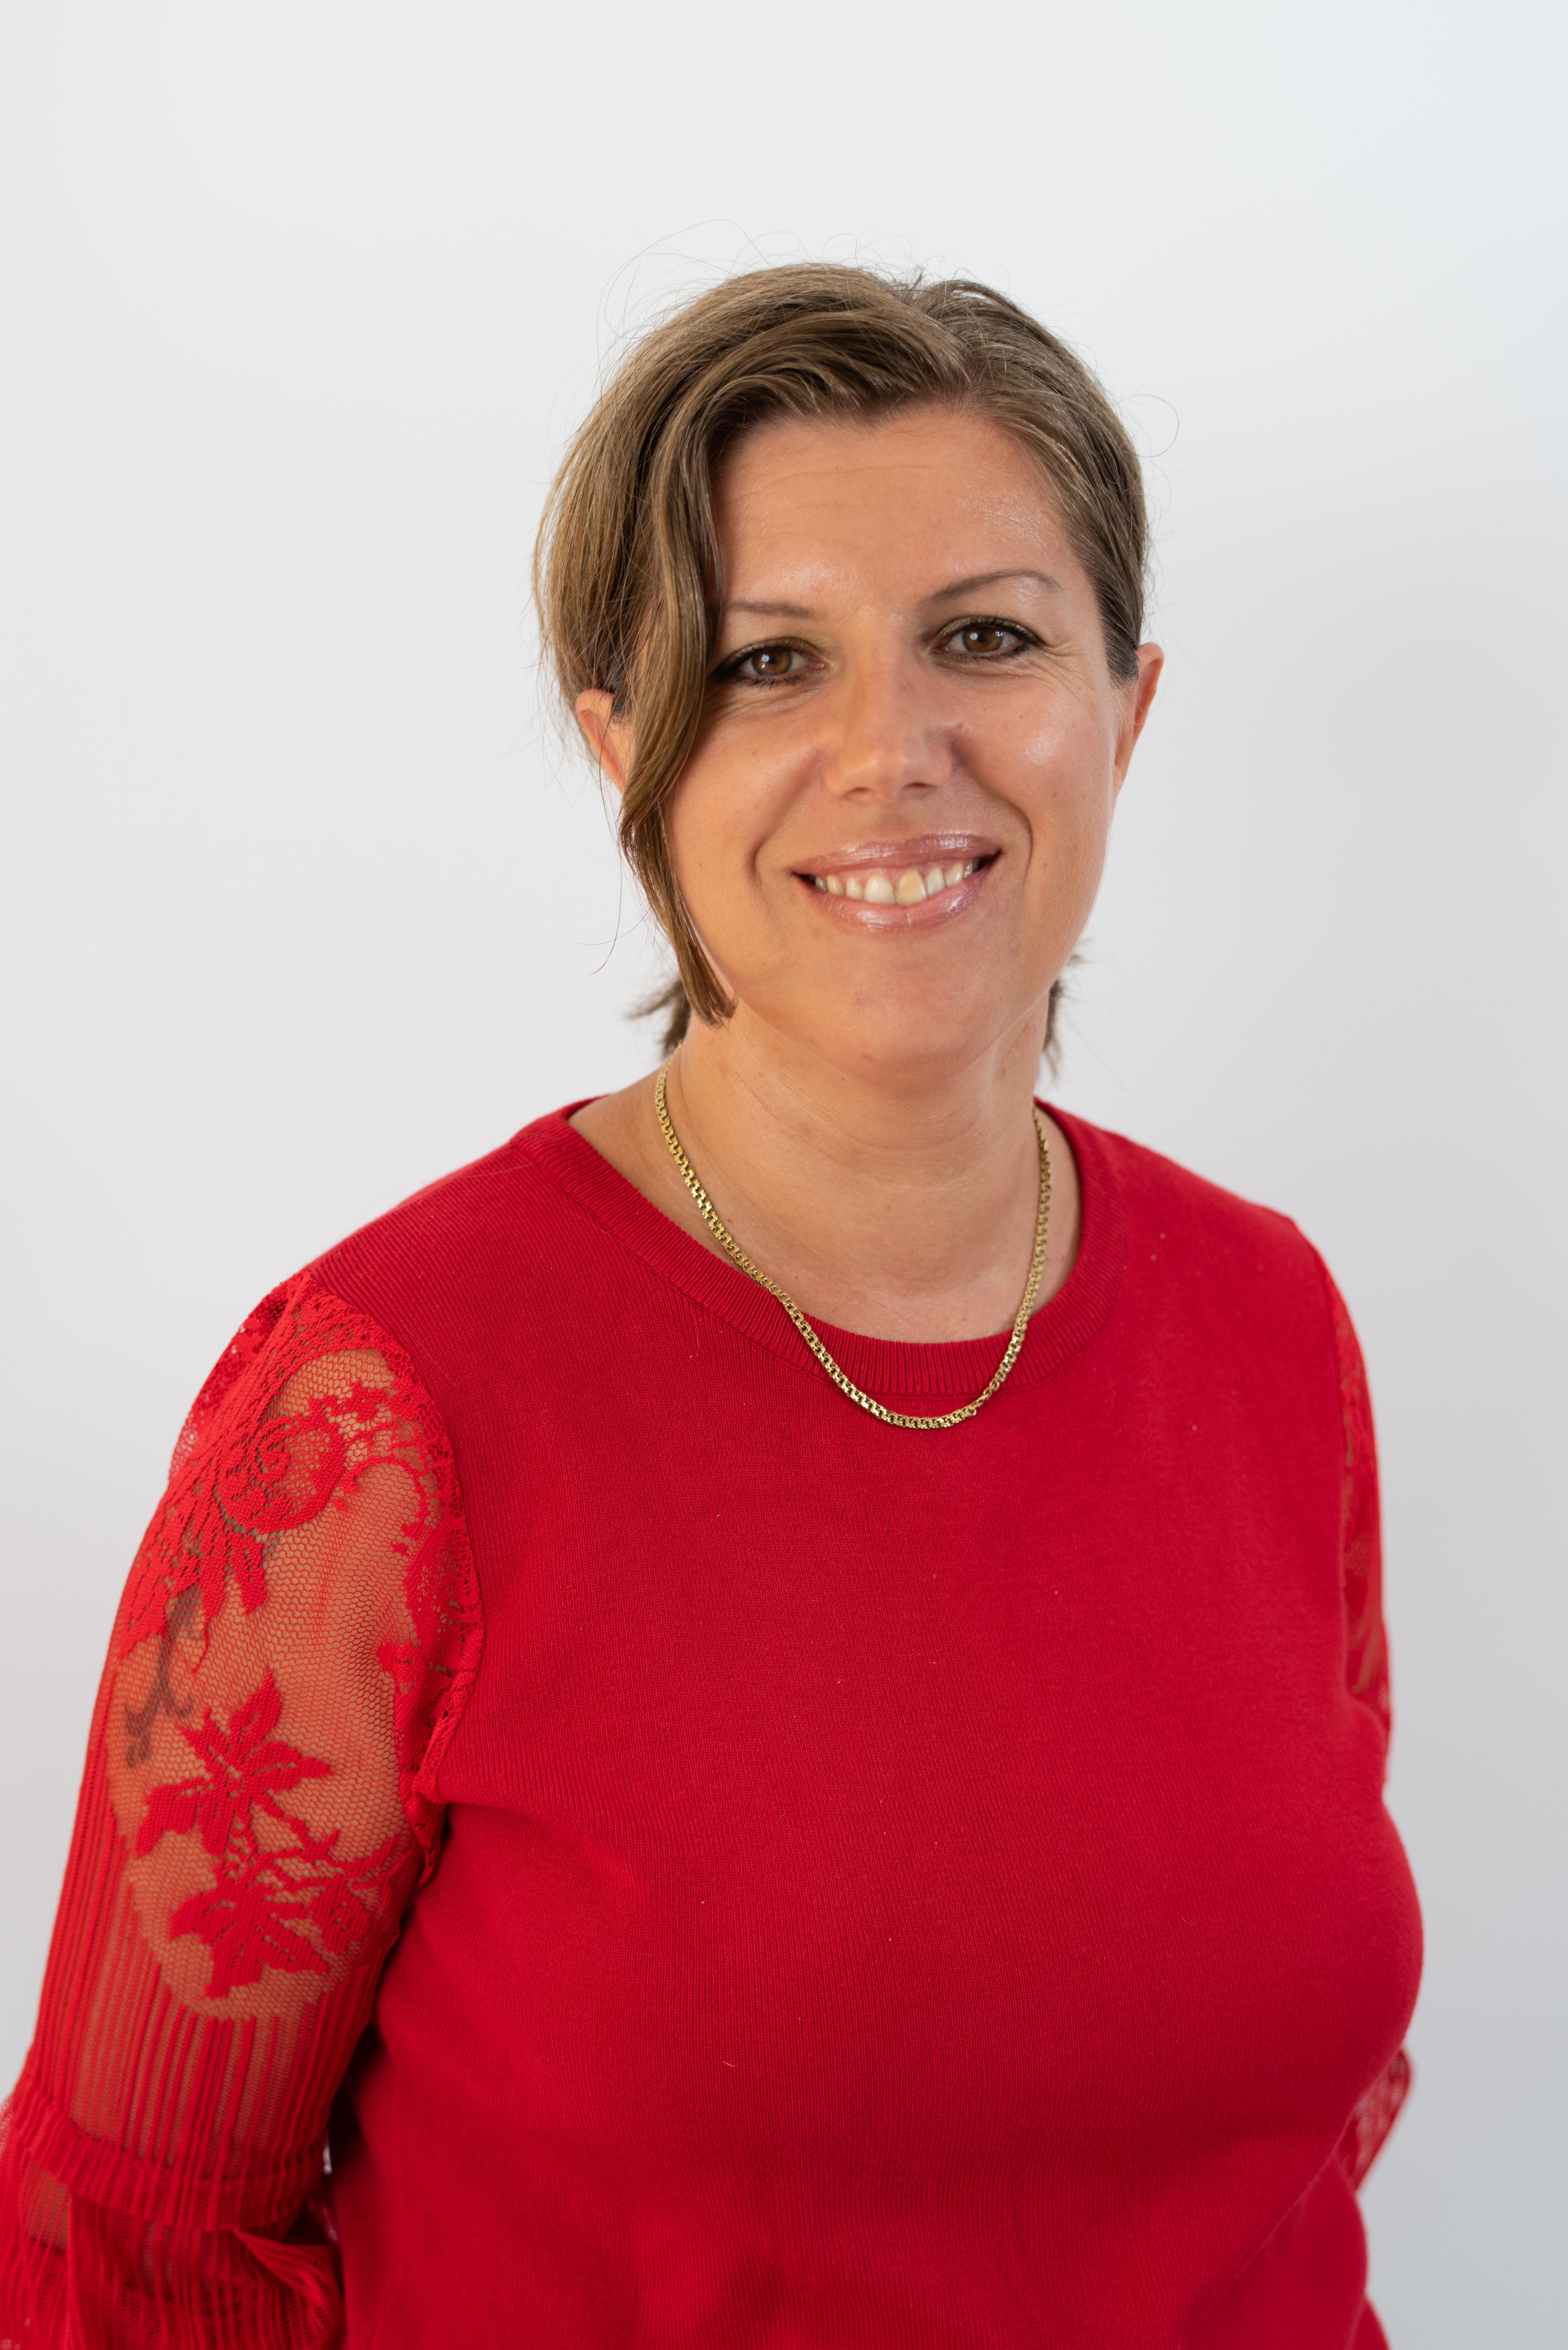 Mirjana Sinkovits